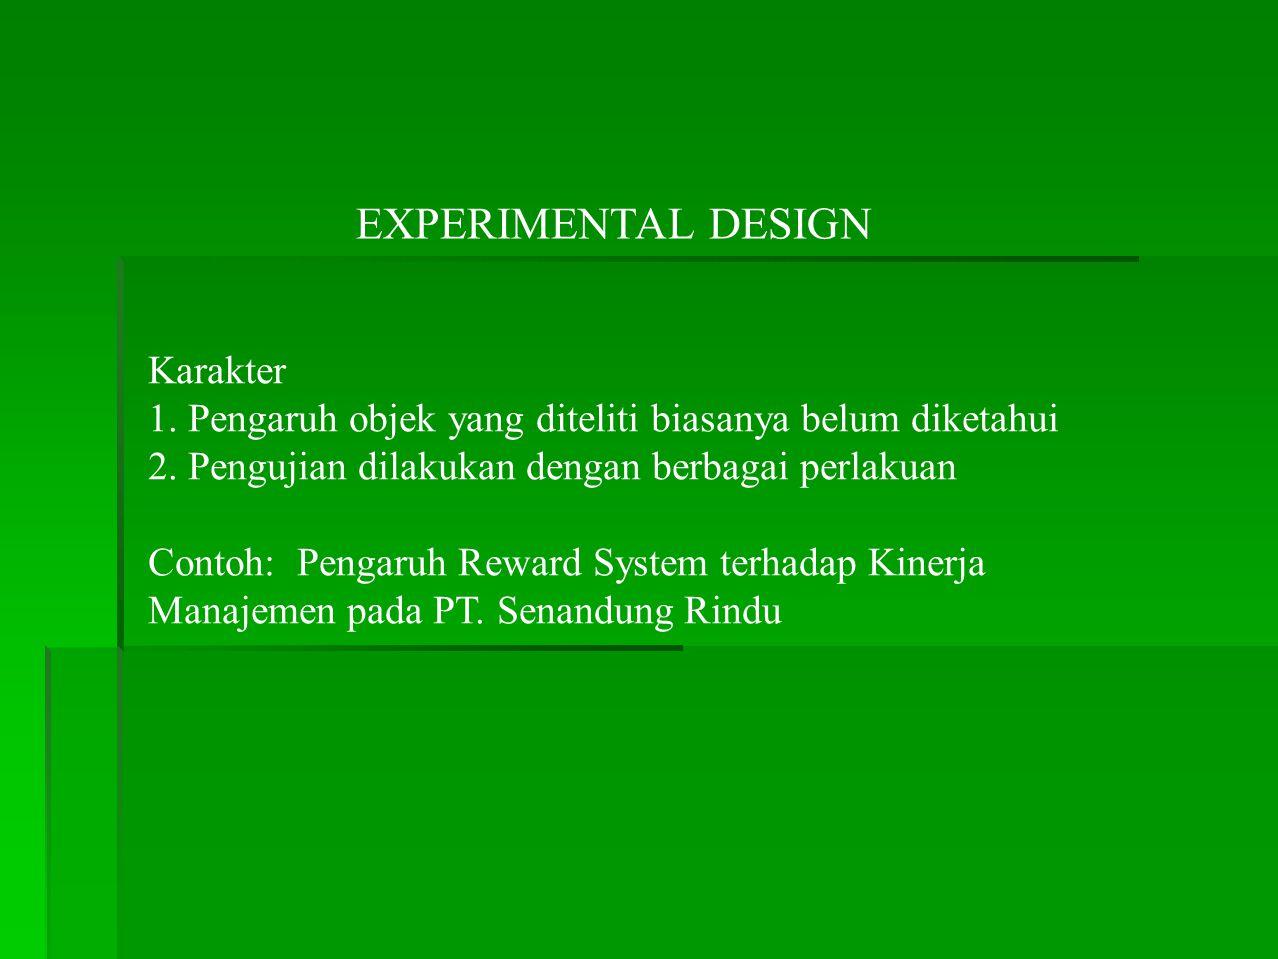 EXPERIMENTAL DESIGN Karakter 1.Pengaruh objek yang diteliti biasanya belum diketahui 2.